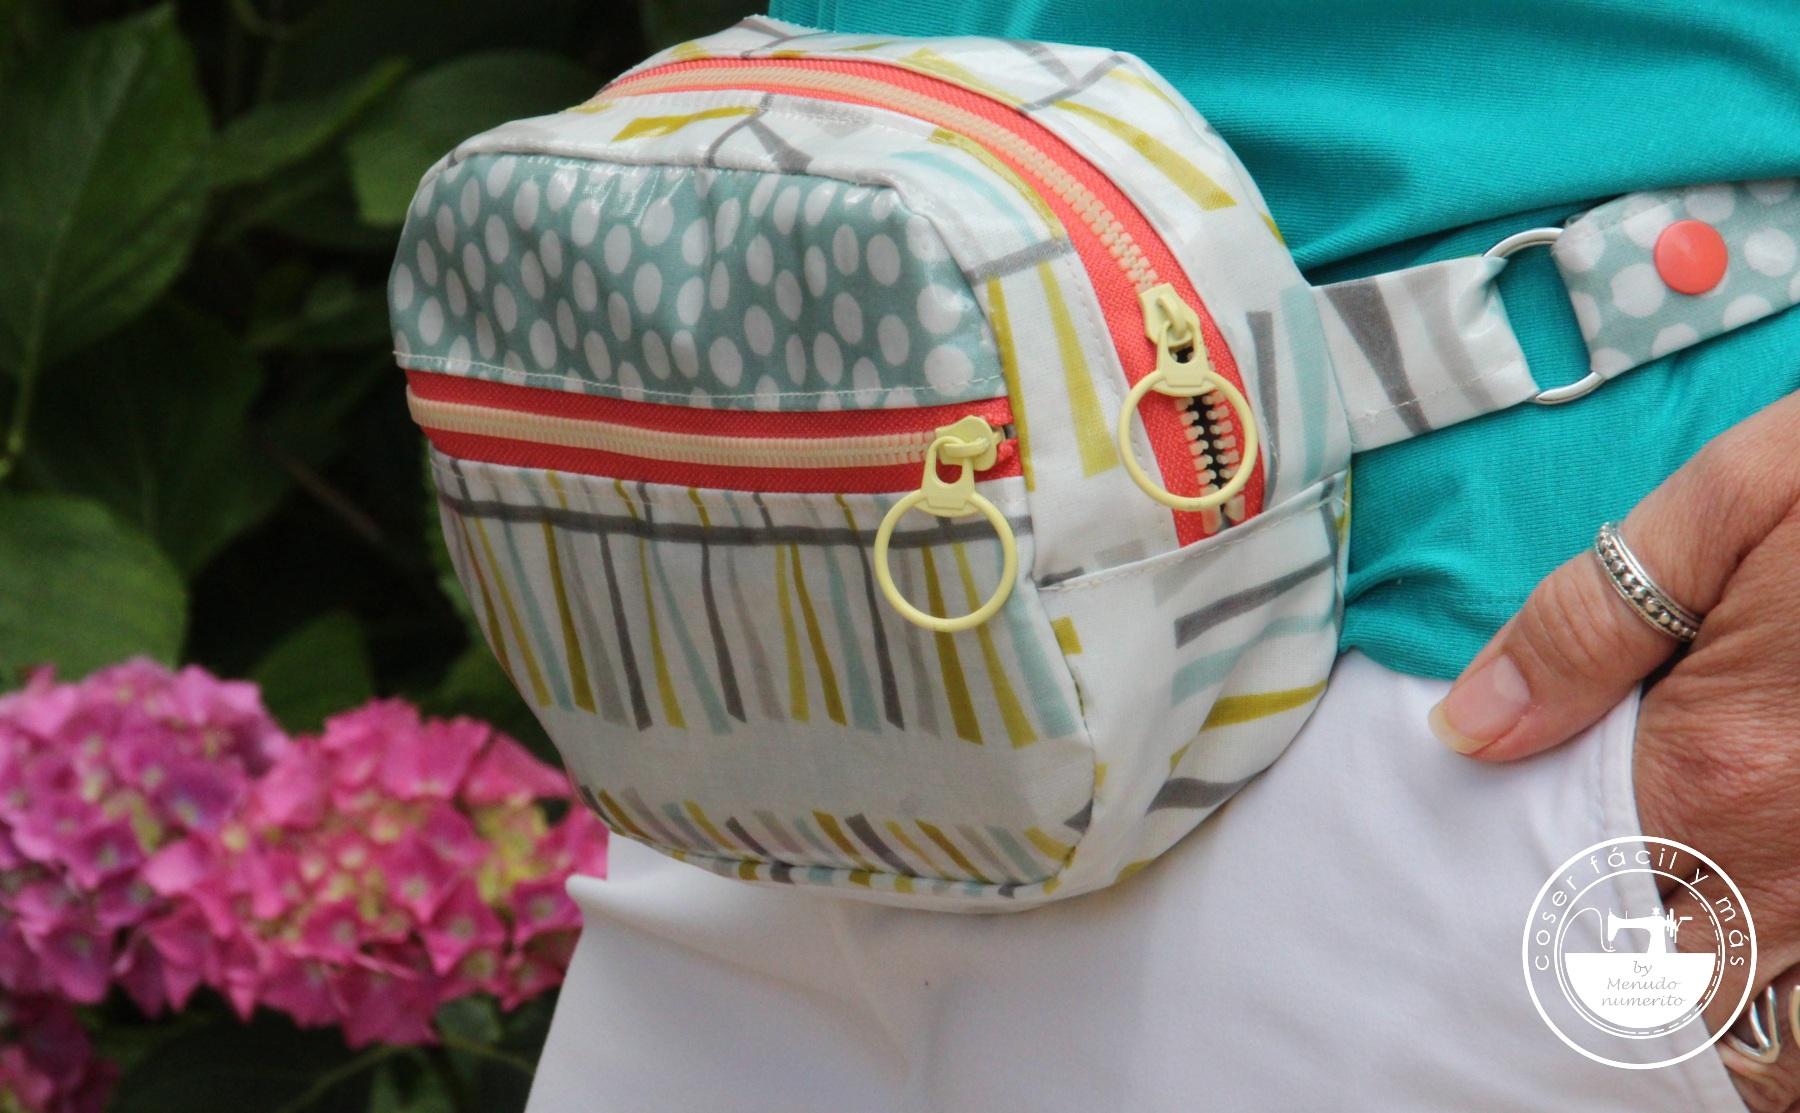 riñonera patrones gratis menudo numerito blogs de costura